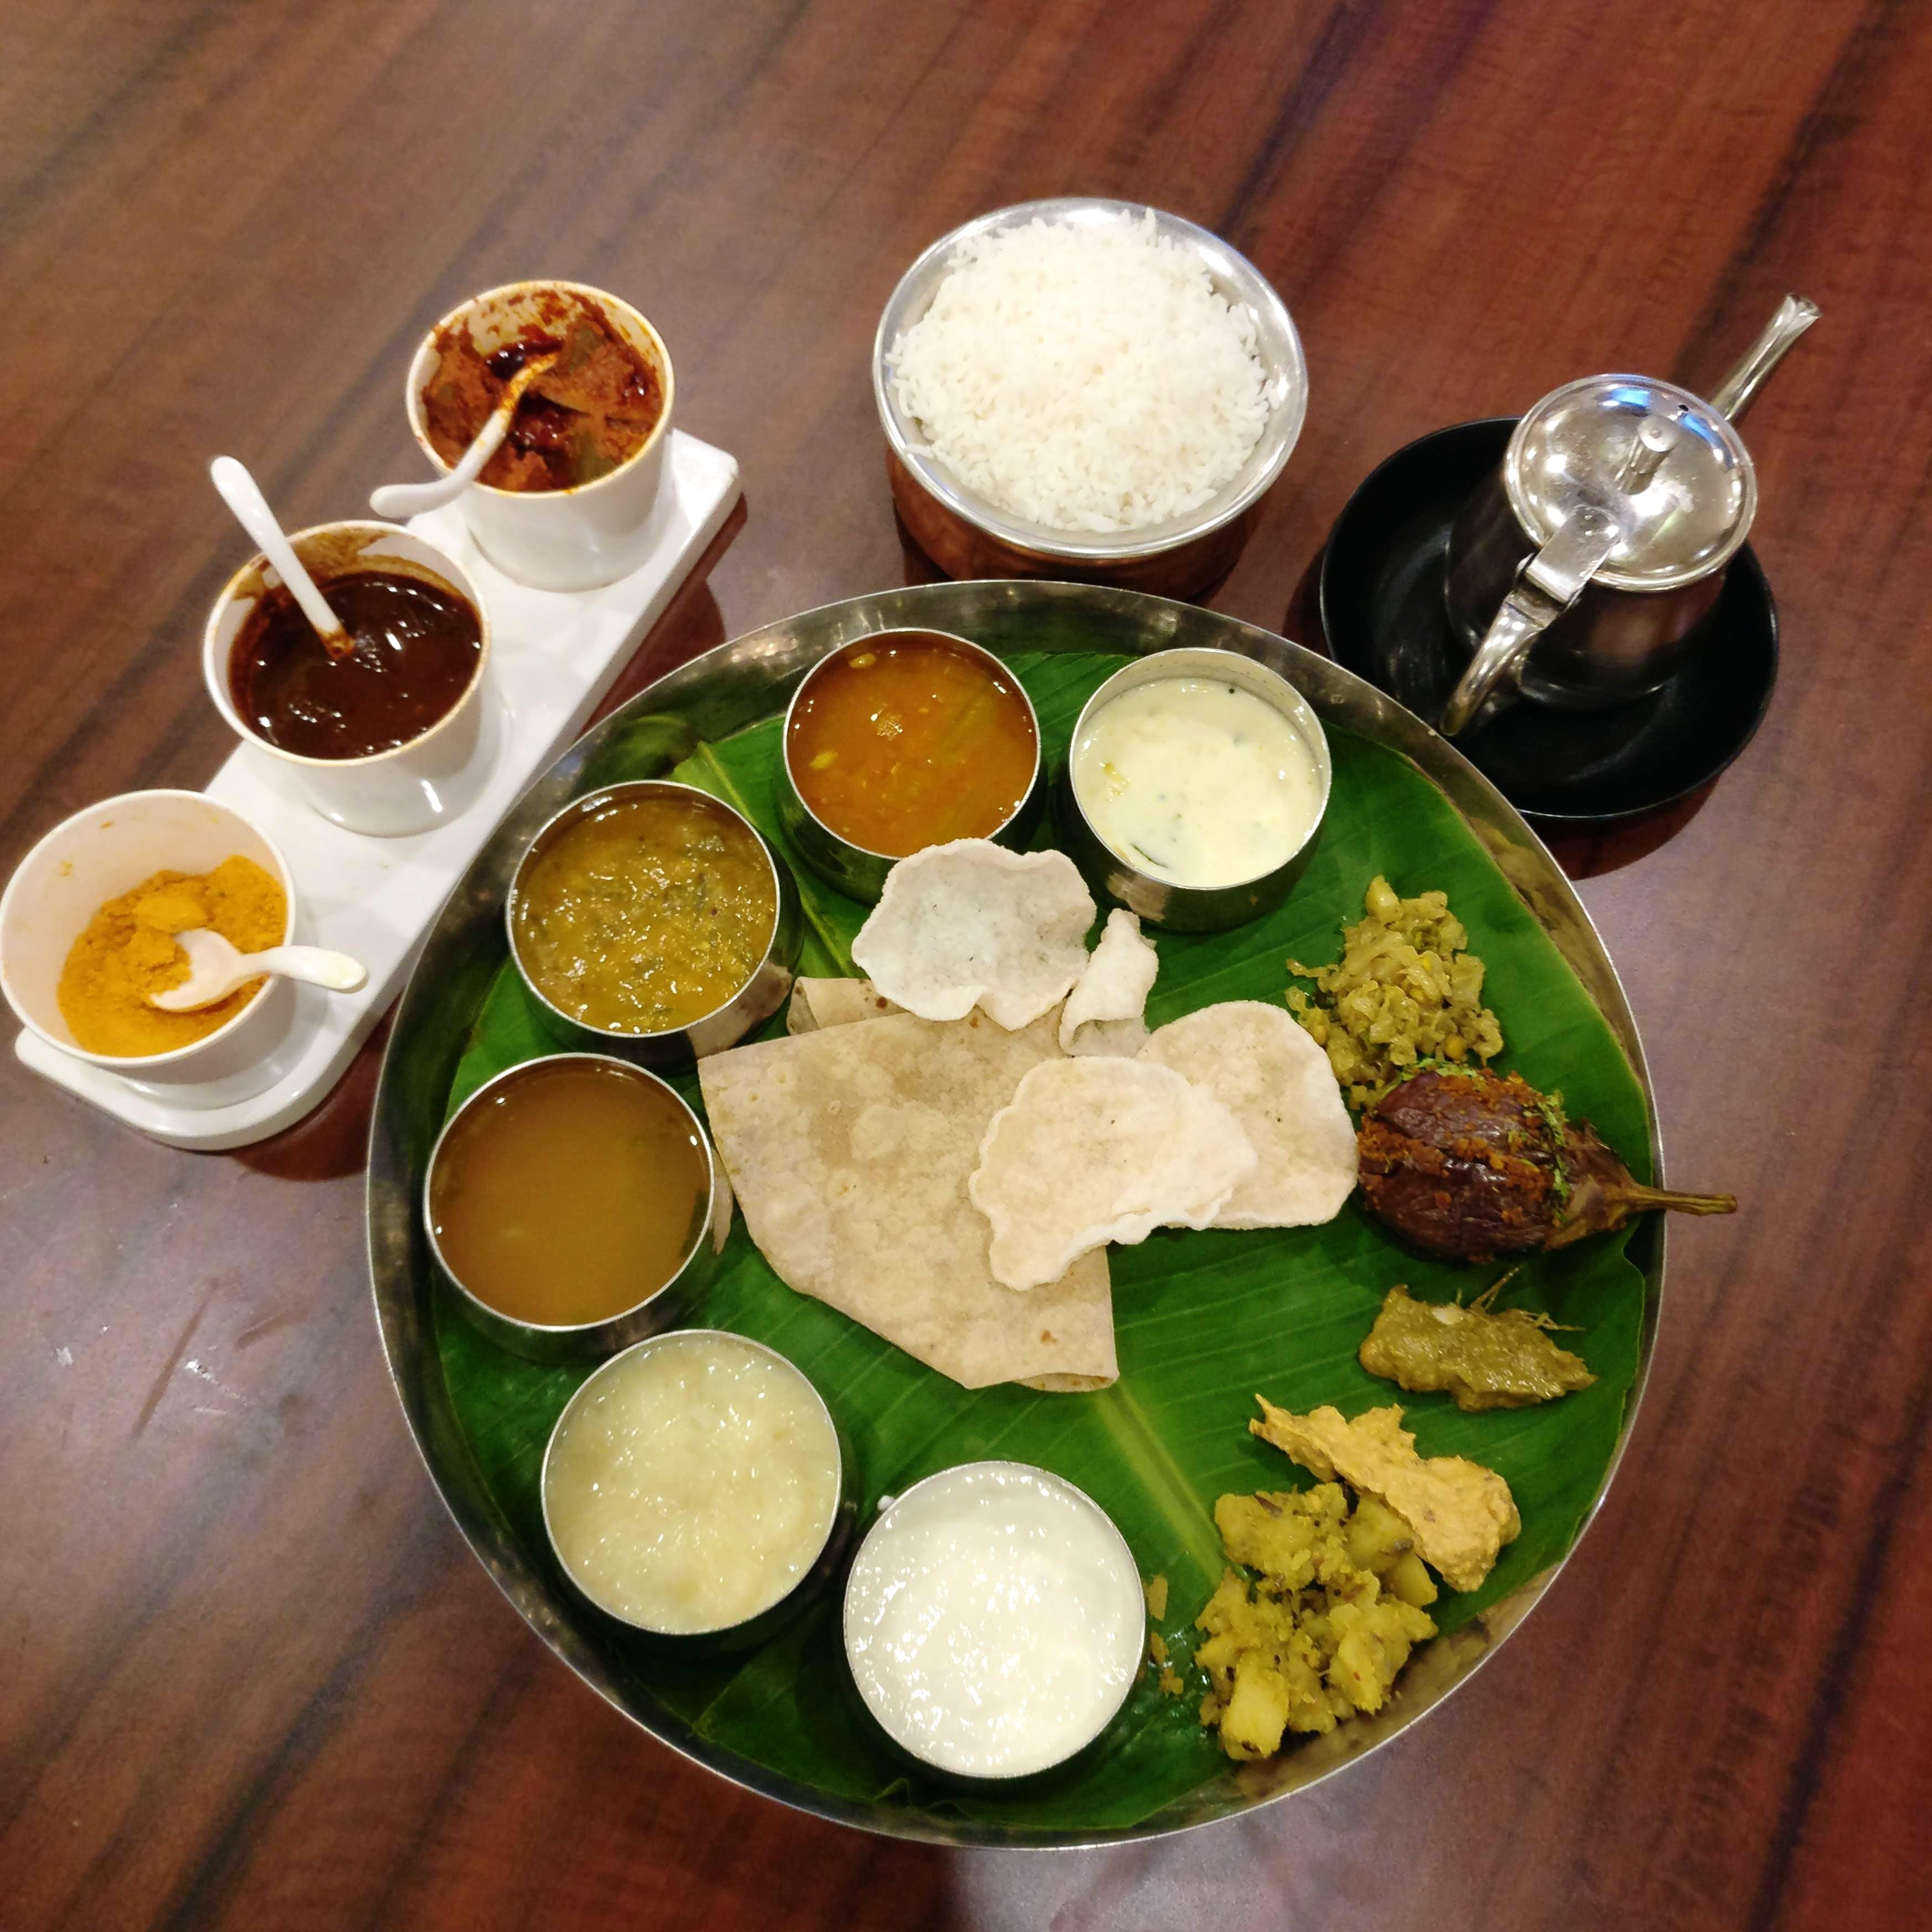 Dish,Food,Cuisine,Meal,Ingredient,Andhra food,Tamil food,Sadya,Breakfast,Indian cuisine